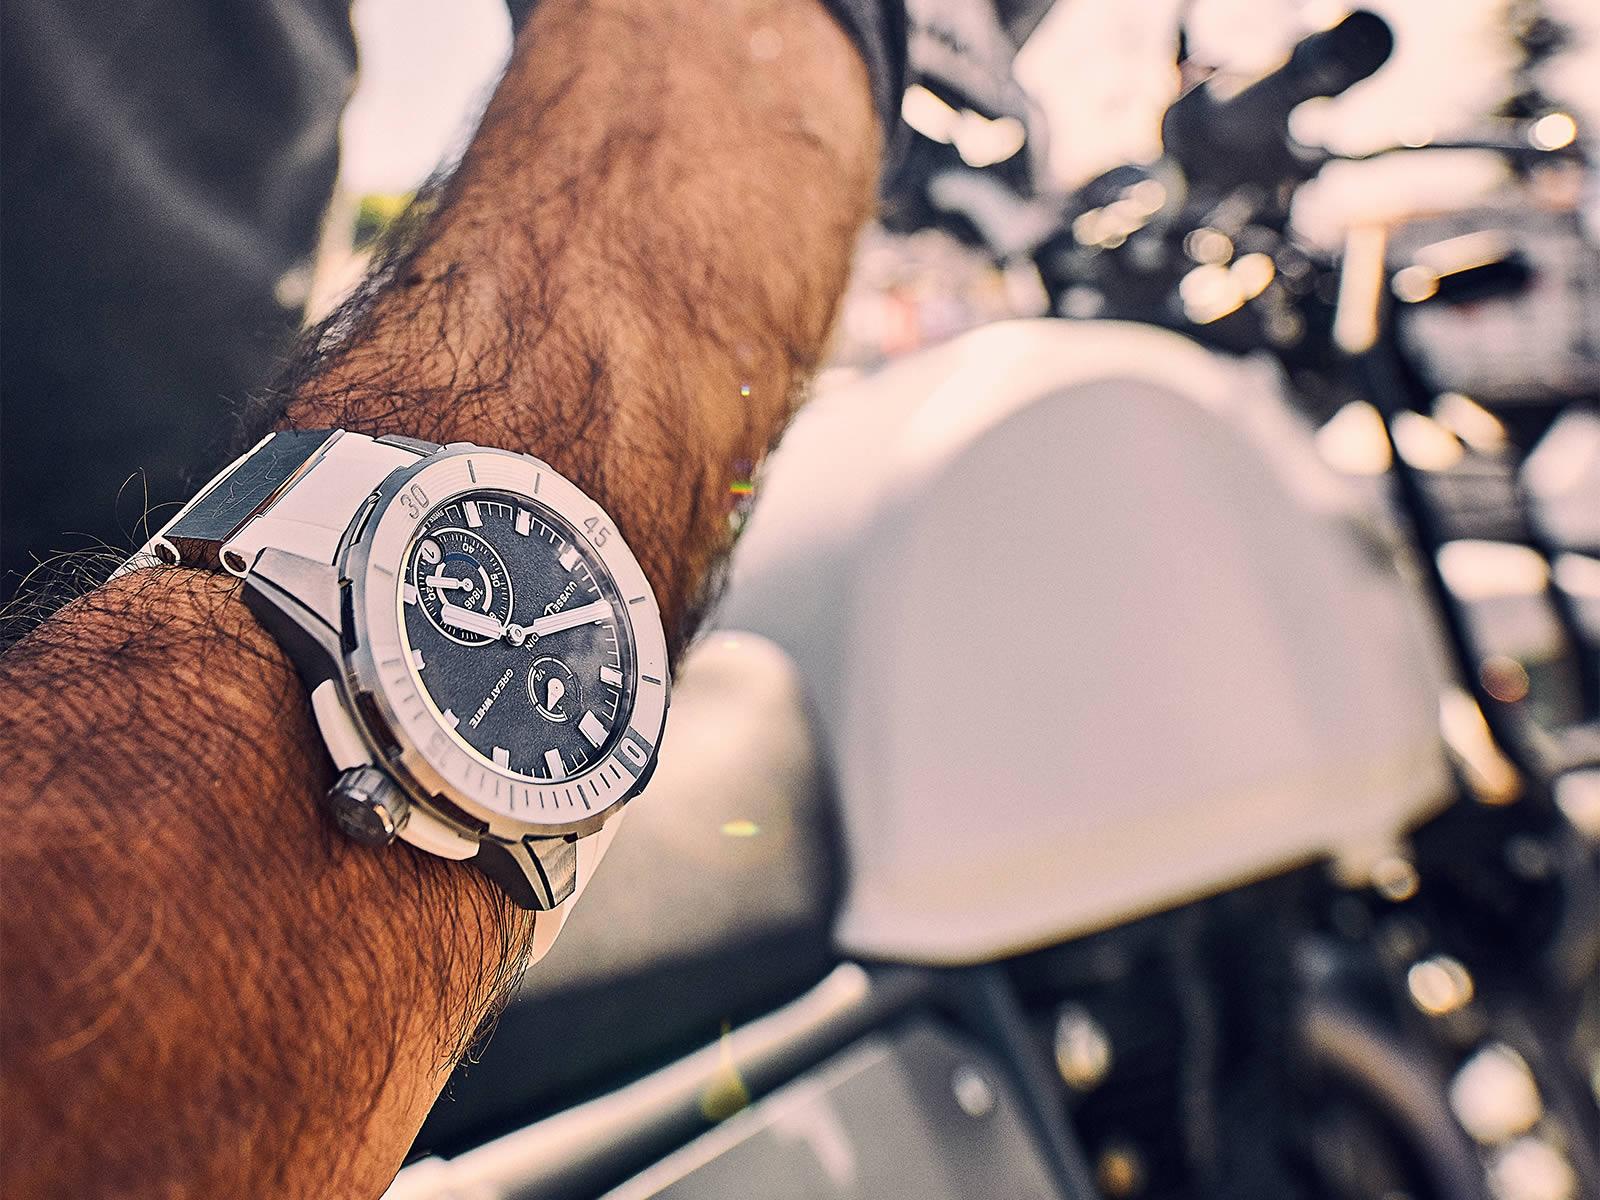 ulysse-nardin-diver-chronometer-2018-models-13-.jpg